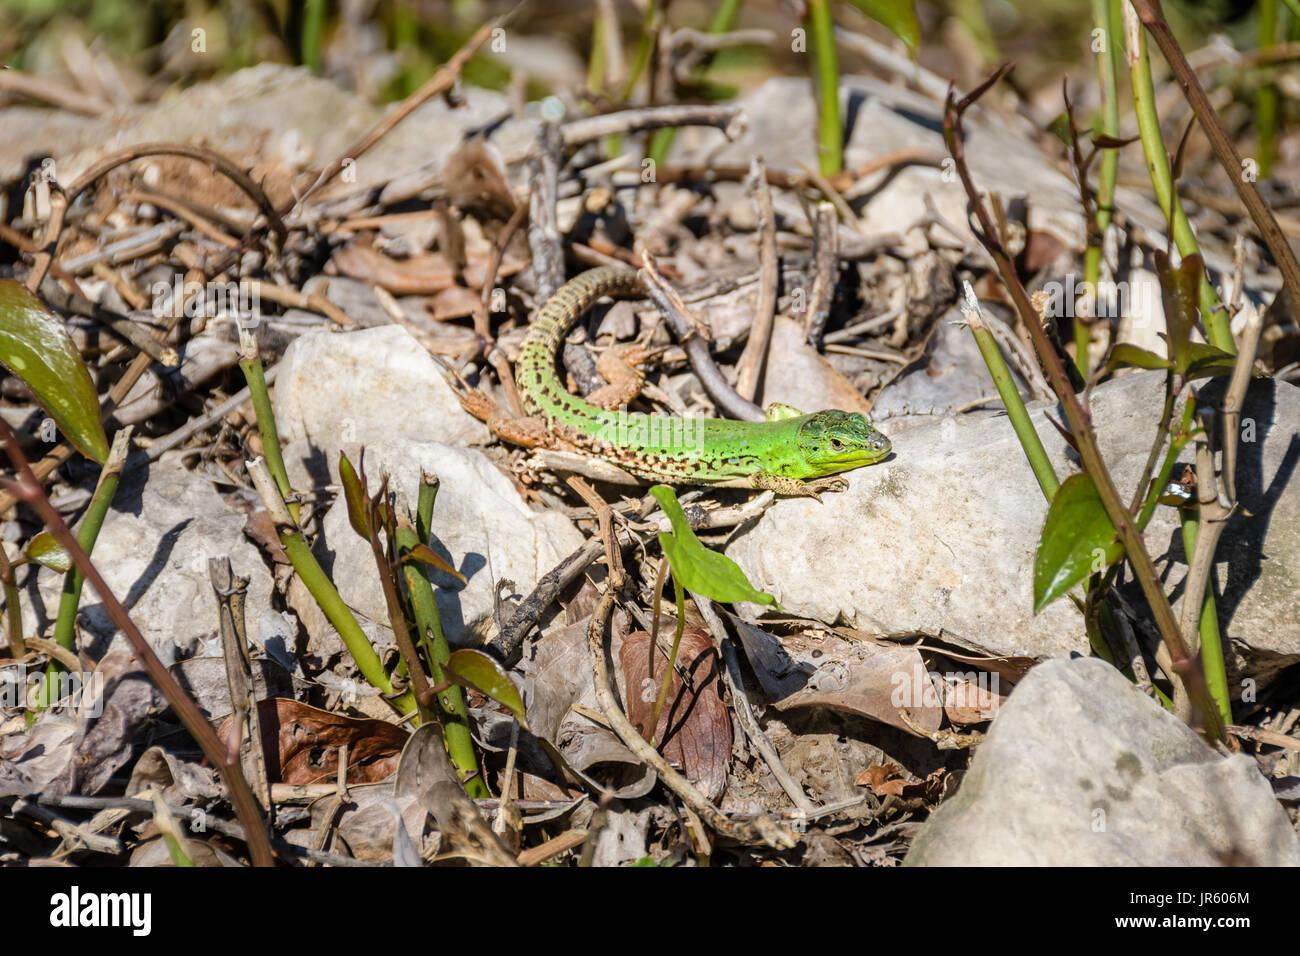 Europei maschili ramarro Lacerta viridis su una roccia Immagini Stock